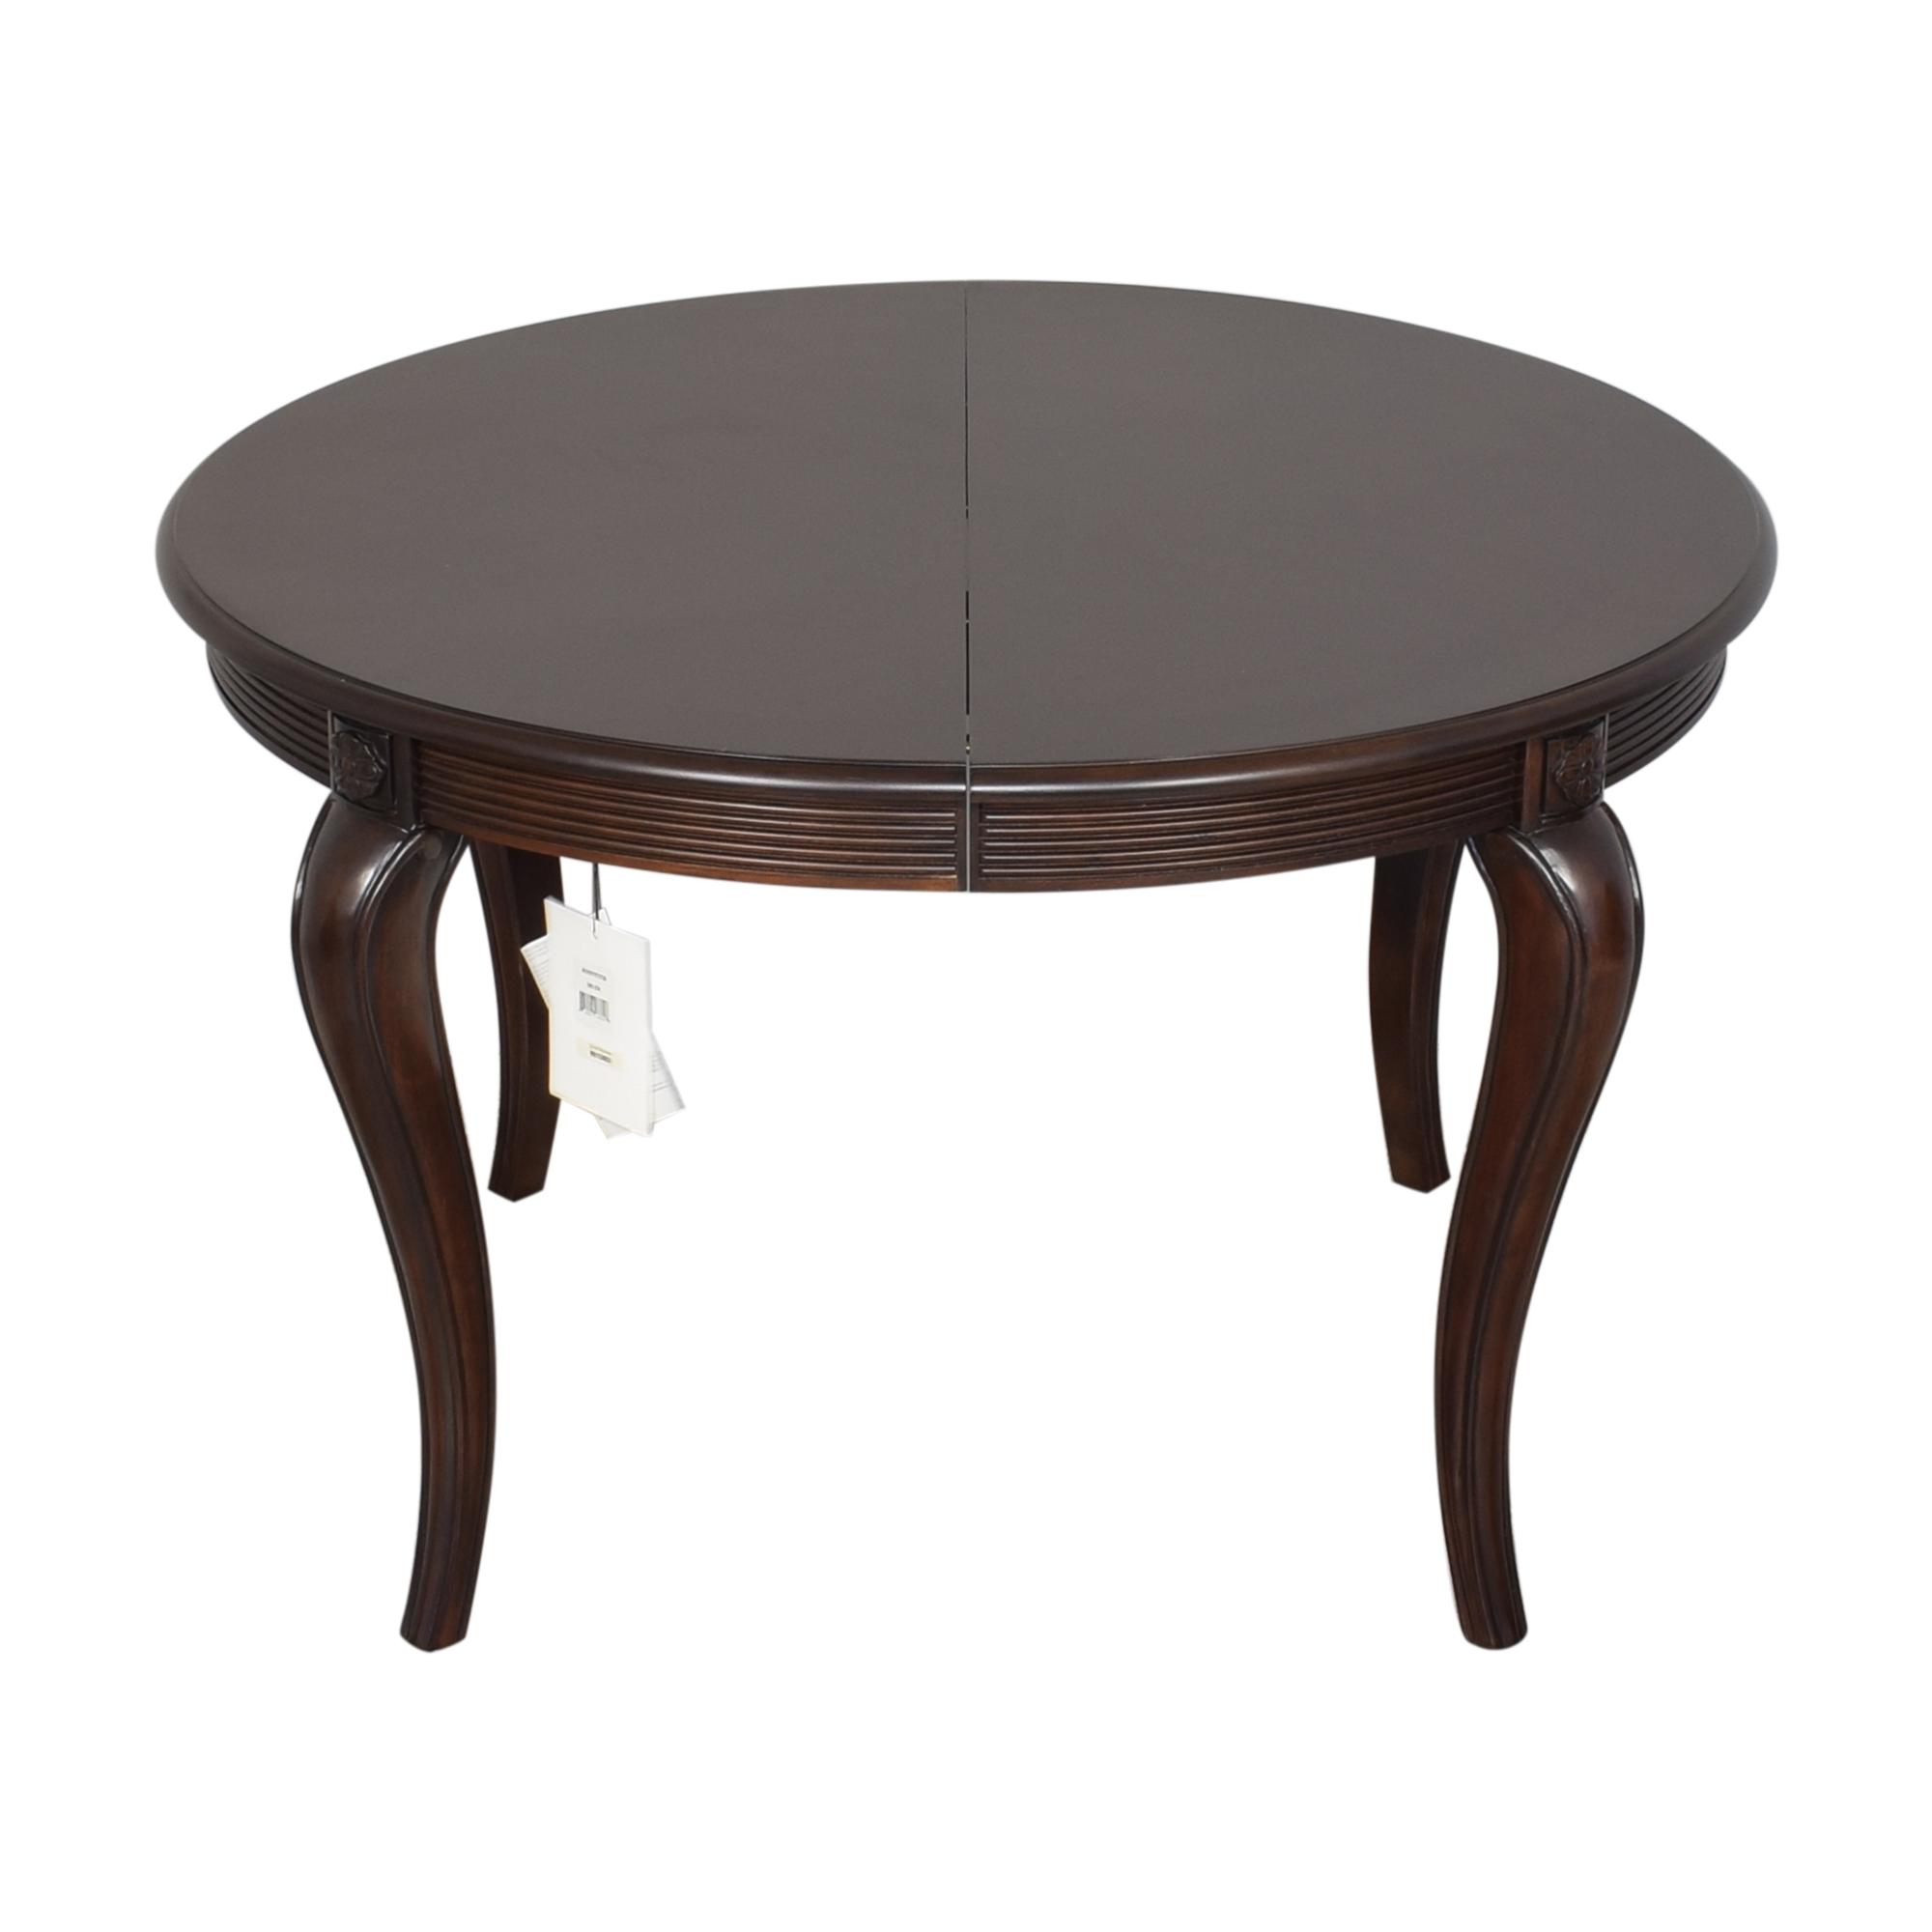 Bernhardt Bernhardt Round Extendable Dining Table second hand